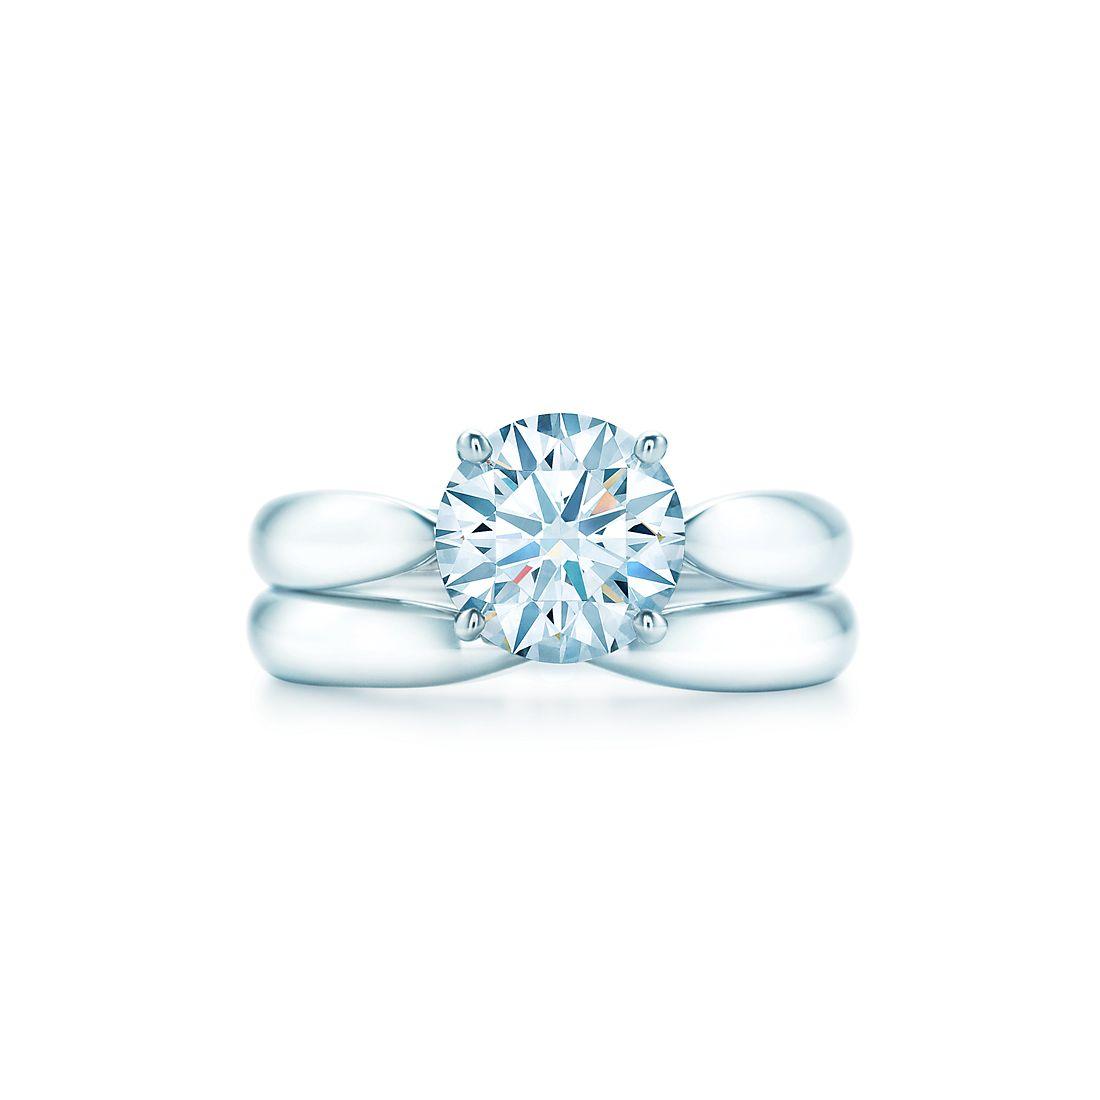 на фото  1,49 кар, второе кольцо — Обручальное кольцо Tiffany Harmony 33481193e28